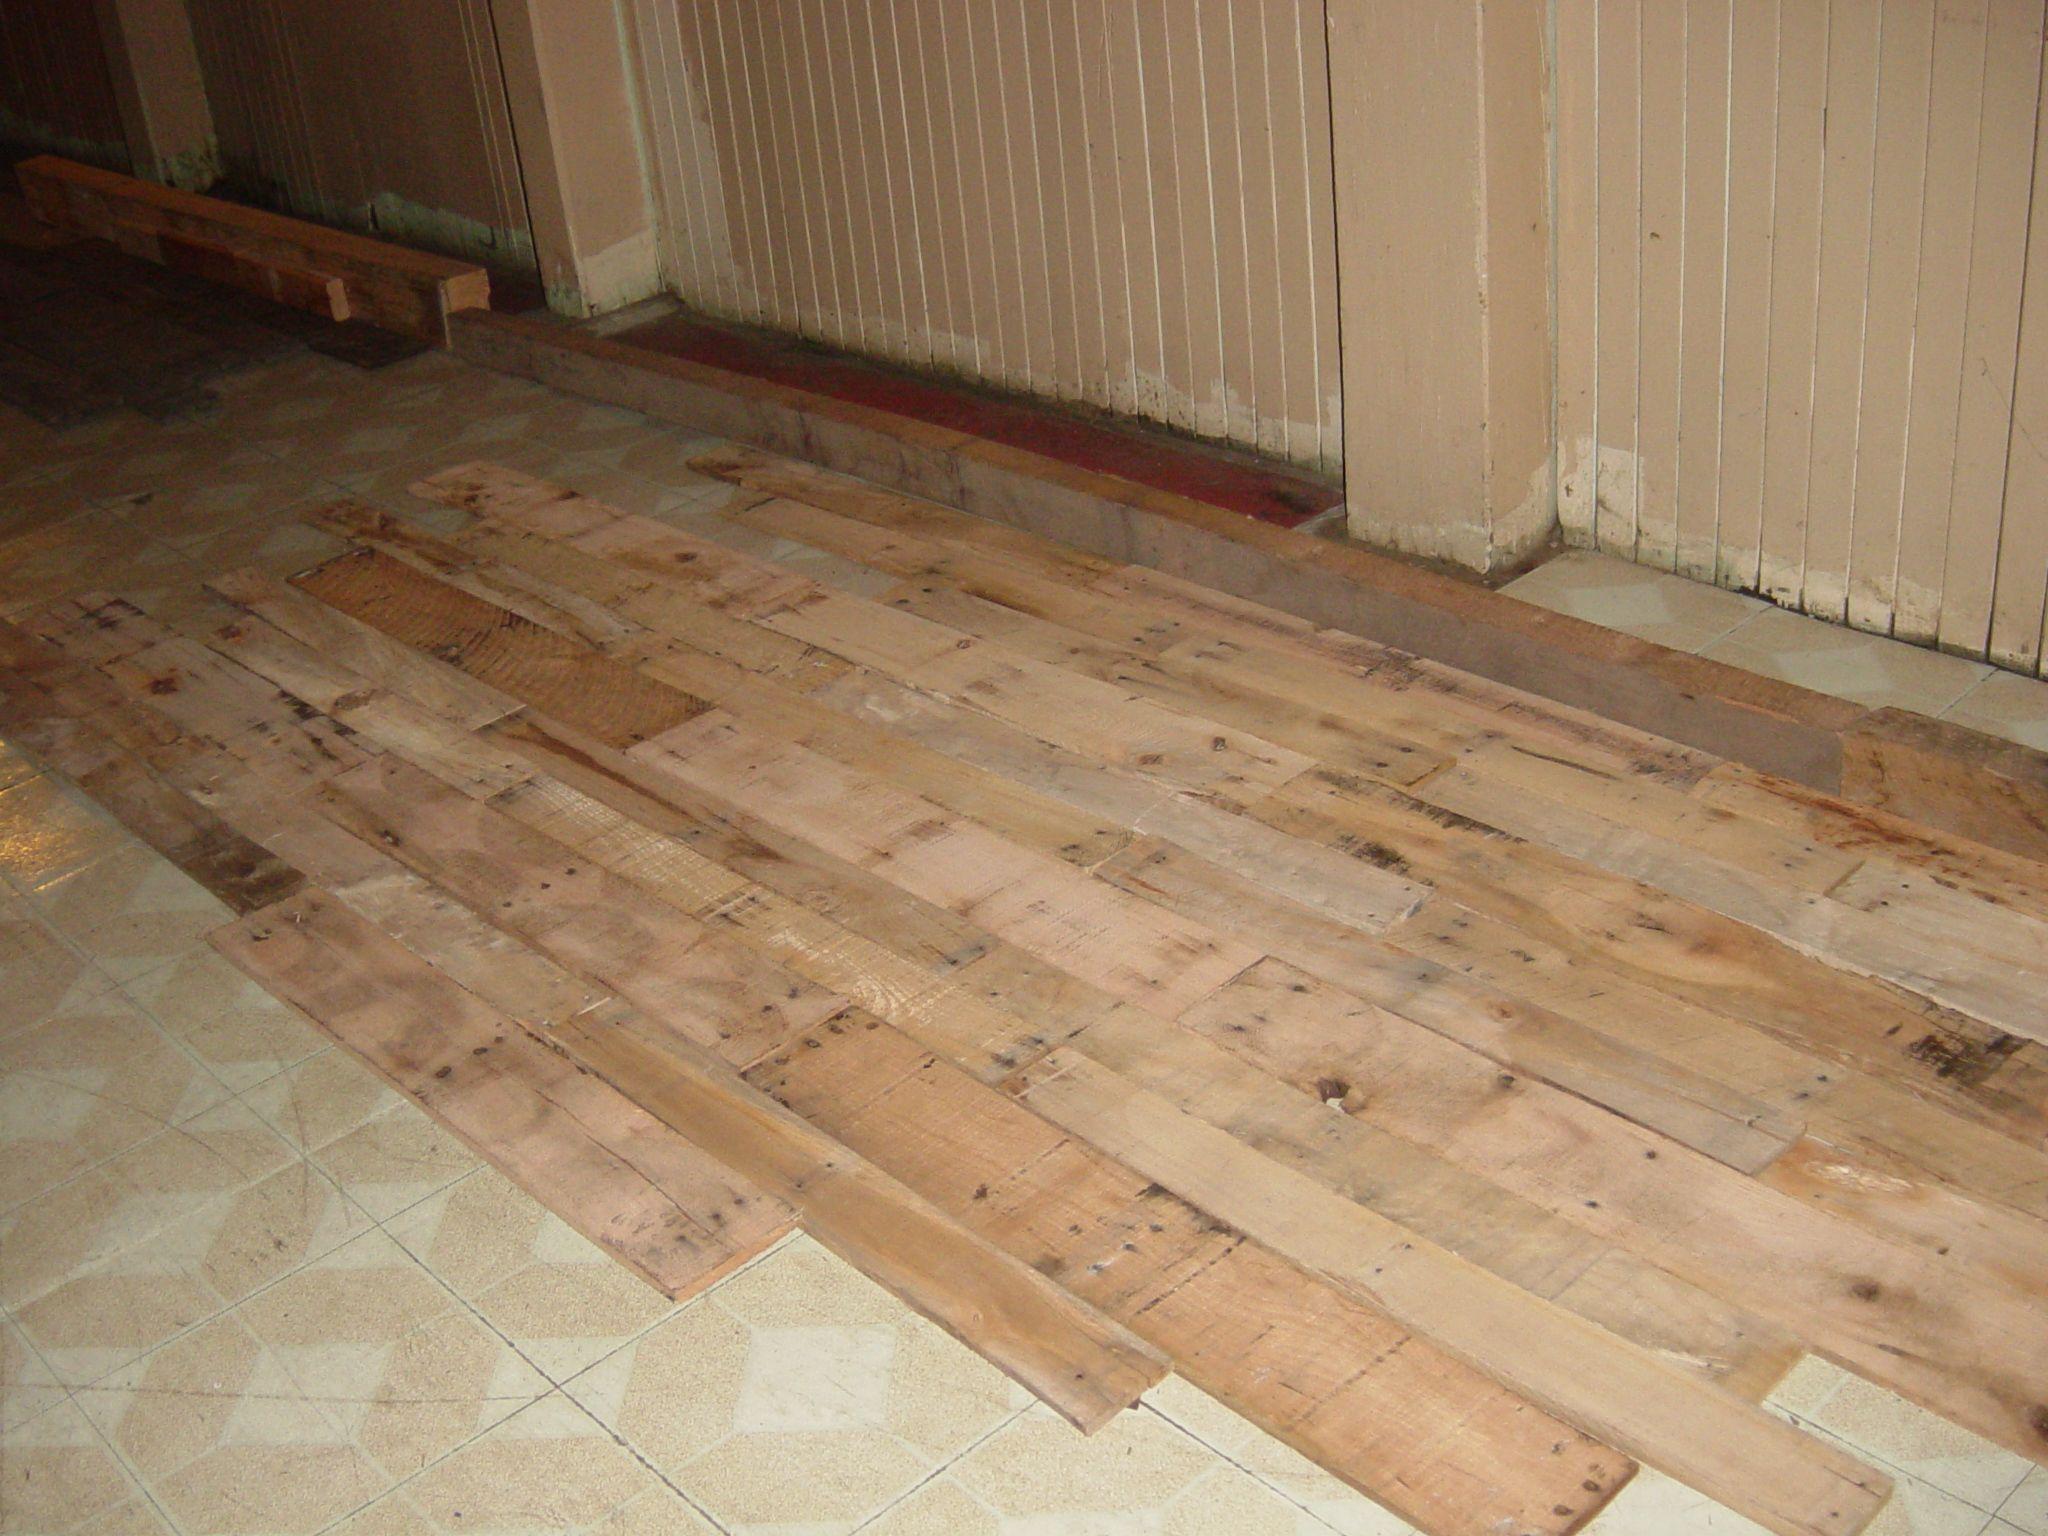 mixed harwood flooring | Pallet floors, Wood pallets ...